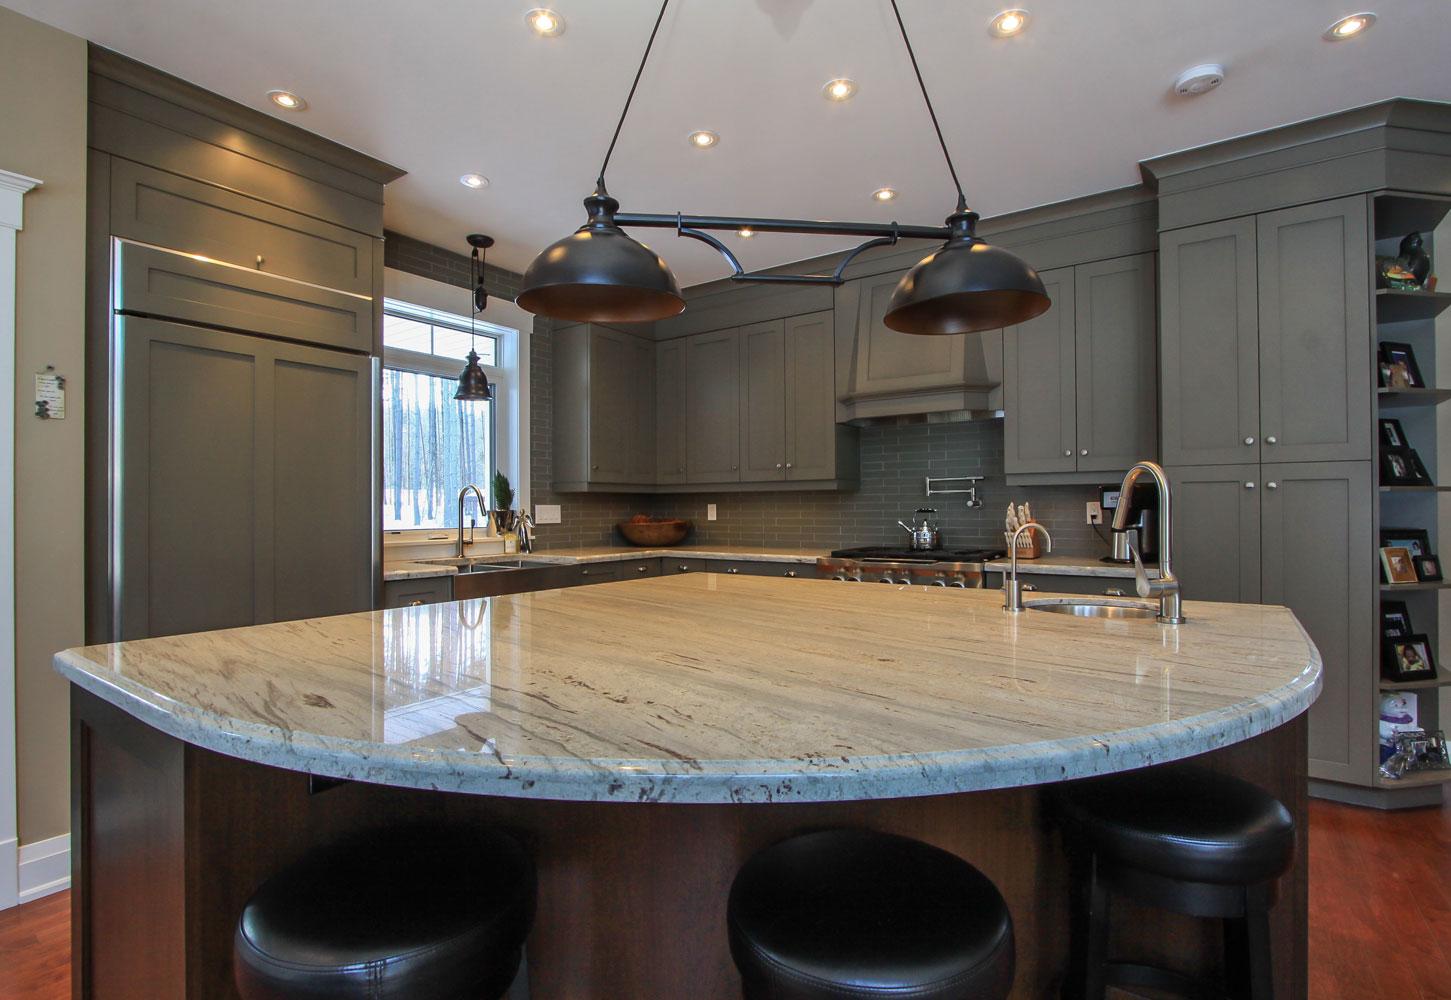 Rounded kitchen island design